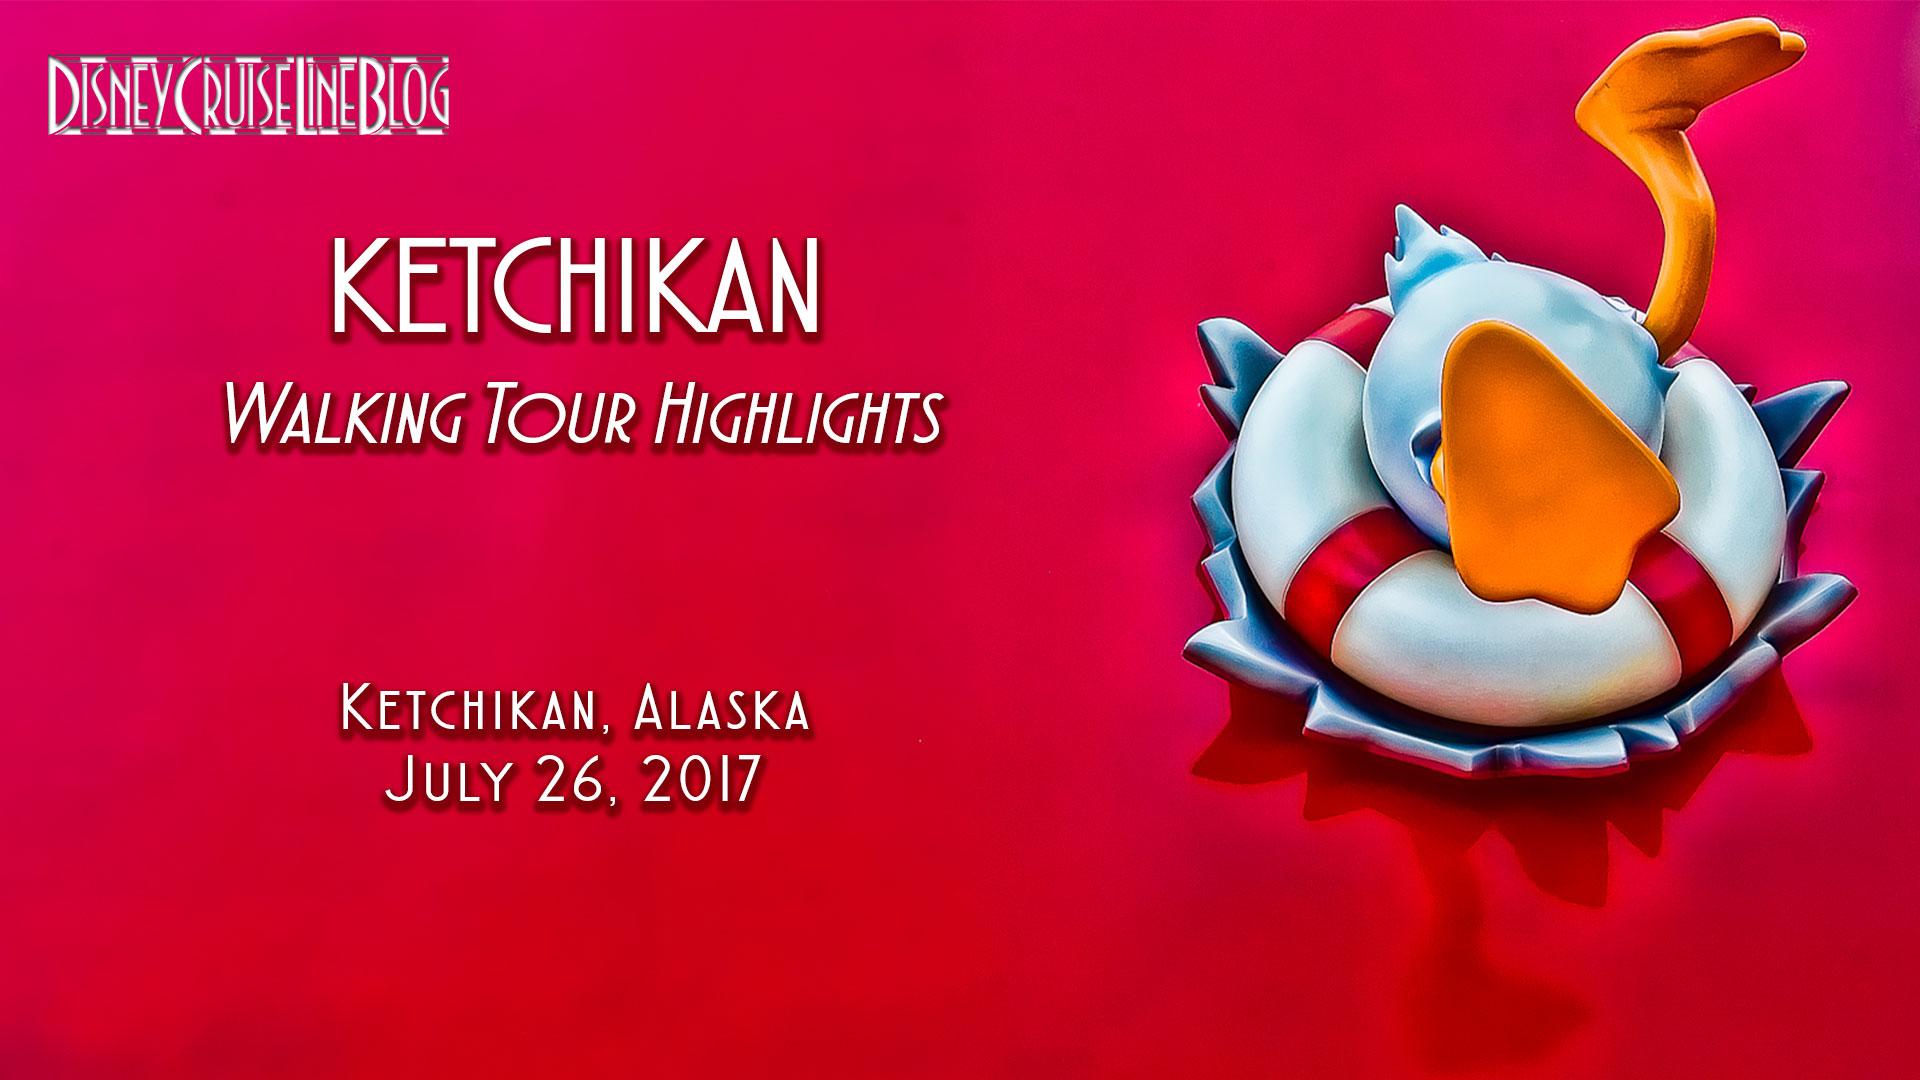 Ketchikan Walking Tour Hightlights Video